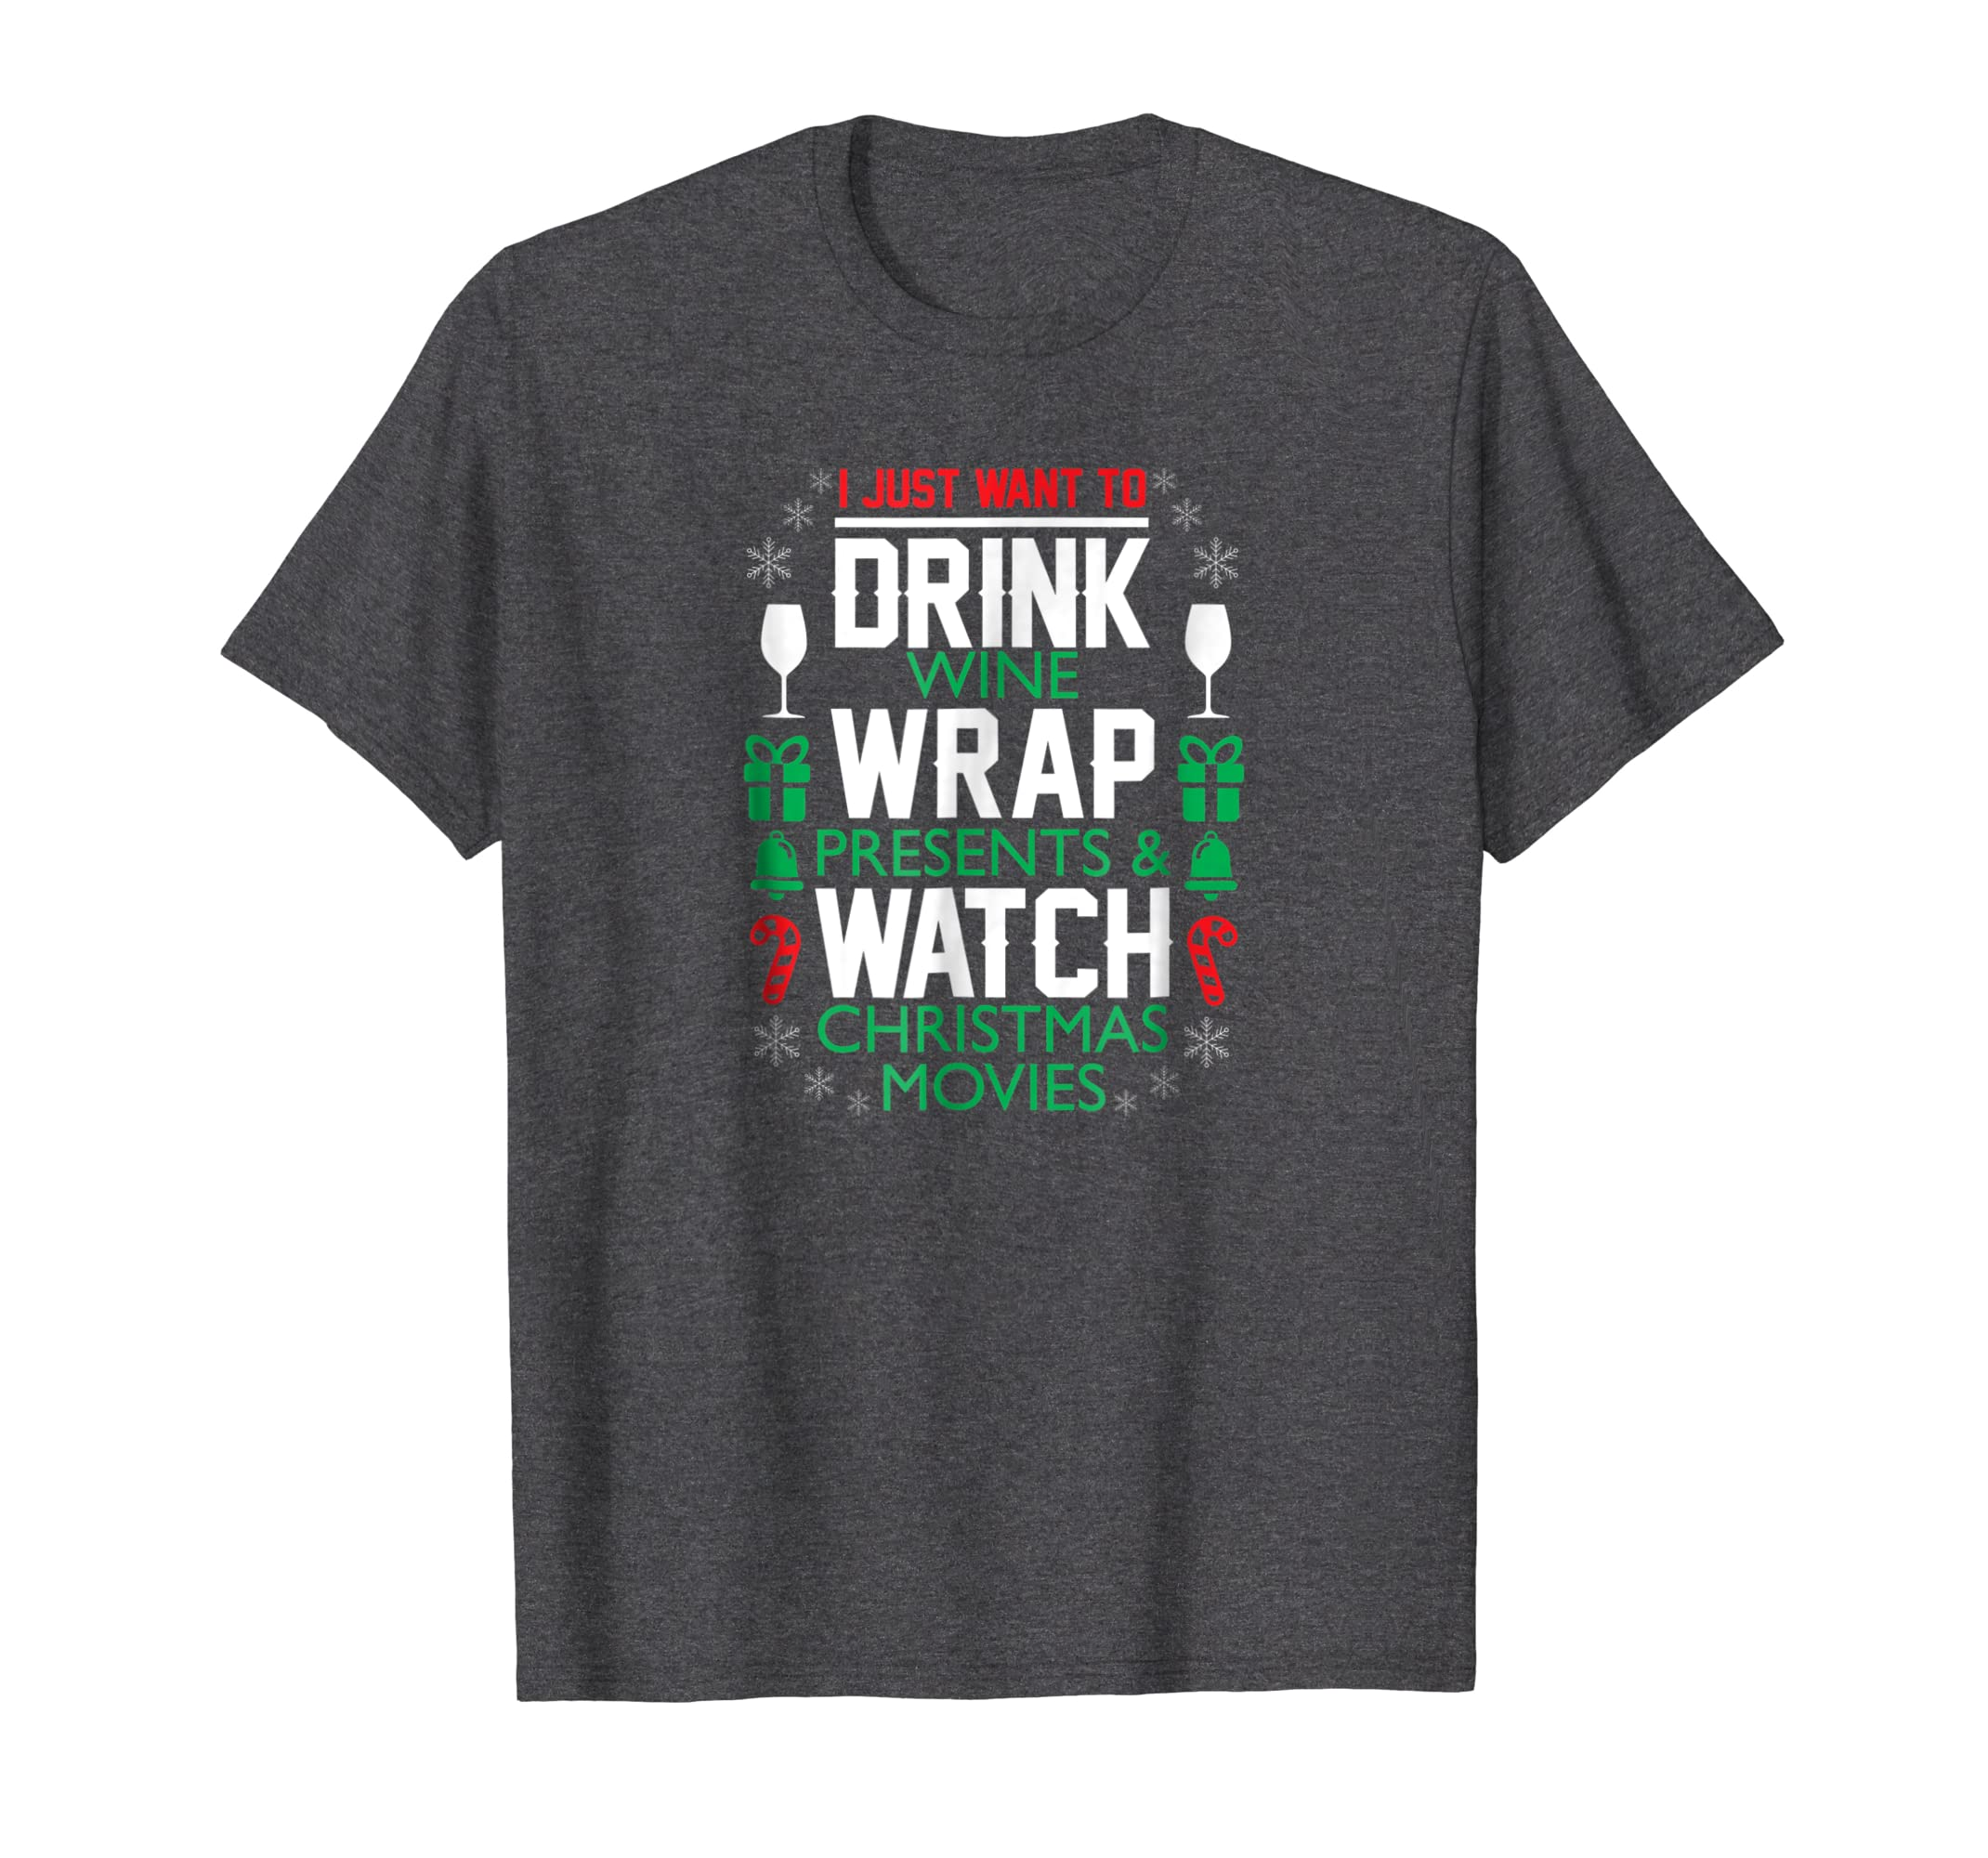 4f167e924 Amazon.com: Funny Wine Tshirt for Women Christmas Shirt for Wine Lovers:  Clothing